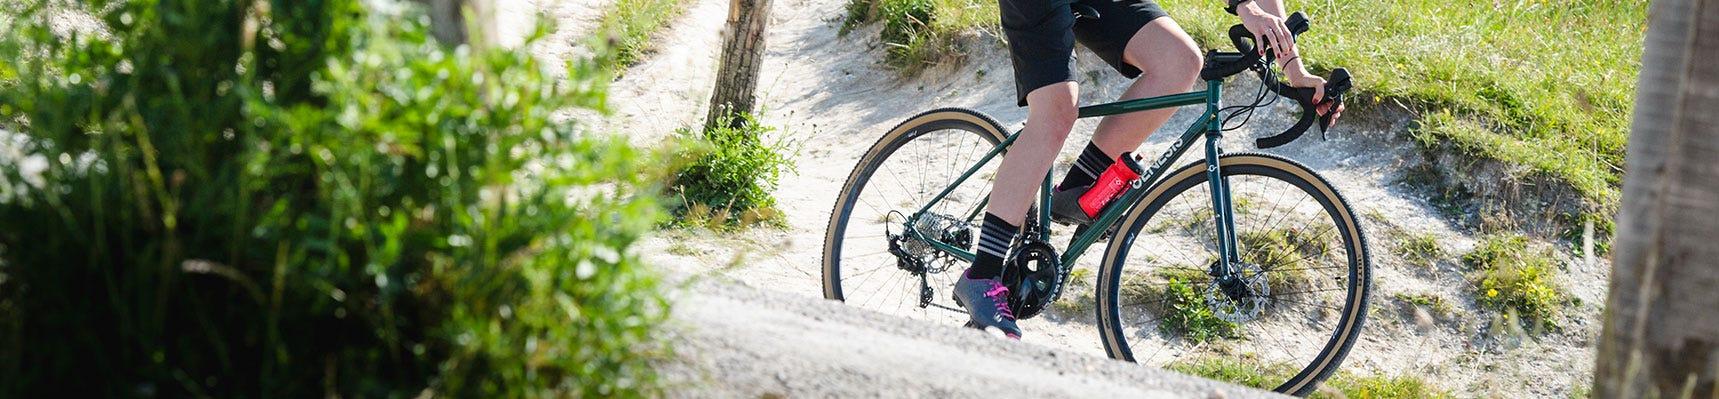 Adventure & Touring Bikes